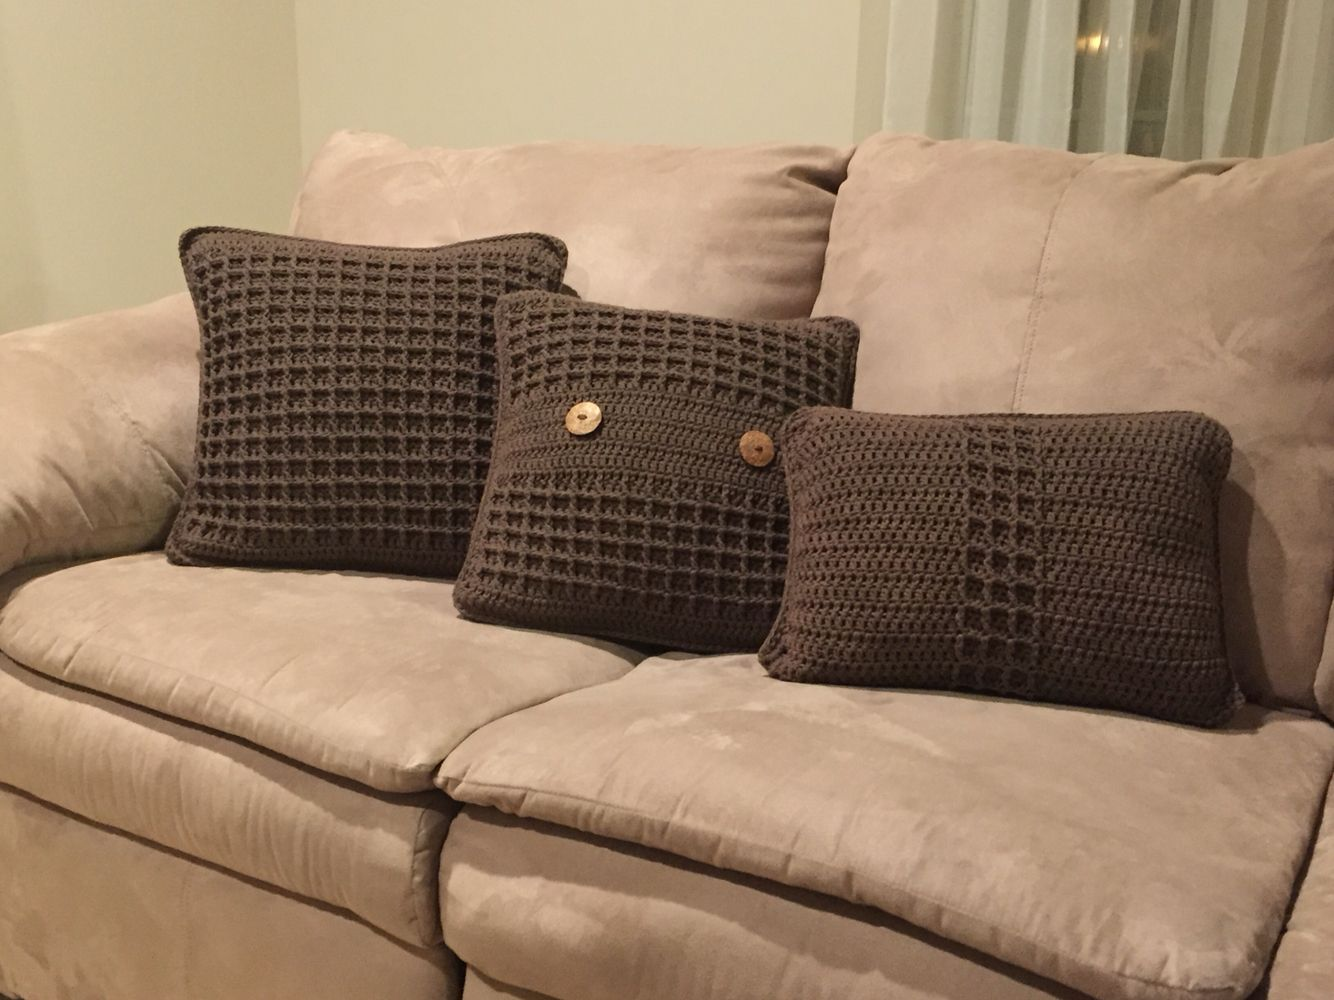 Couch Cushions Crochet Waffle Stitch Crochet Cushions Crochet Cushion Cover Waffle Stitch